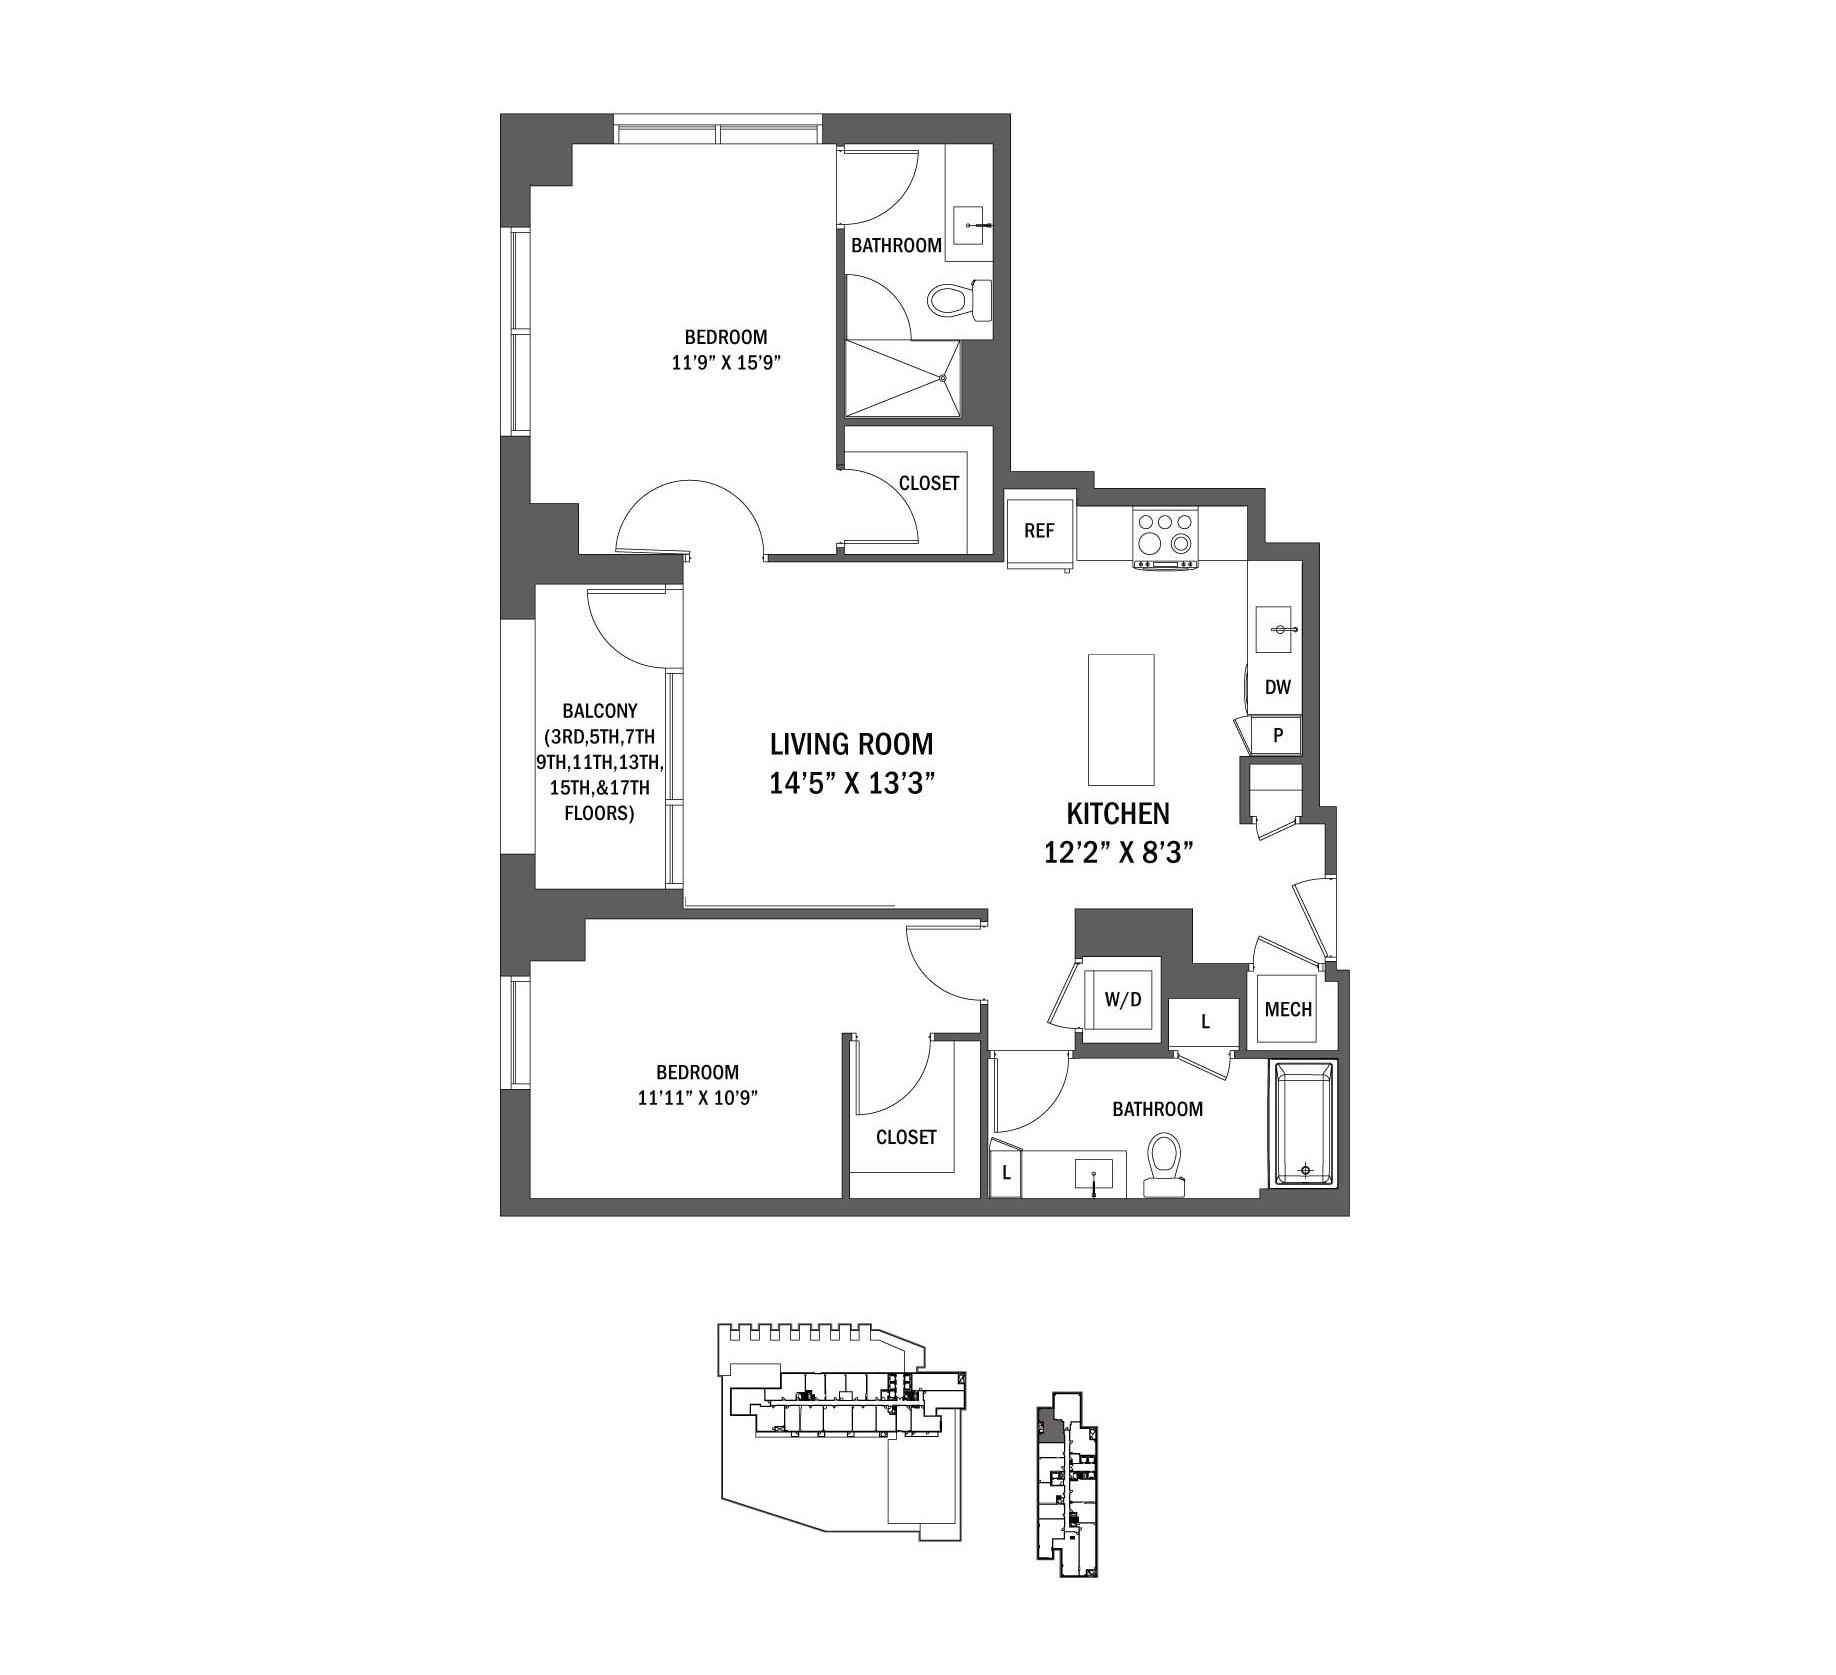 P0625338 789bc21 e03 typ 2 floorplan